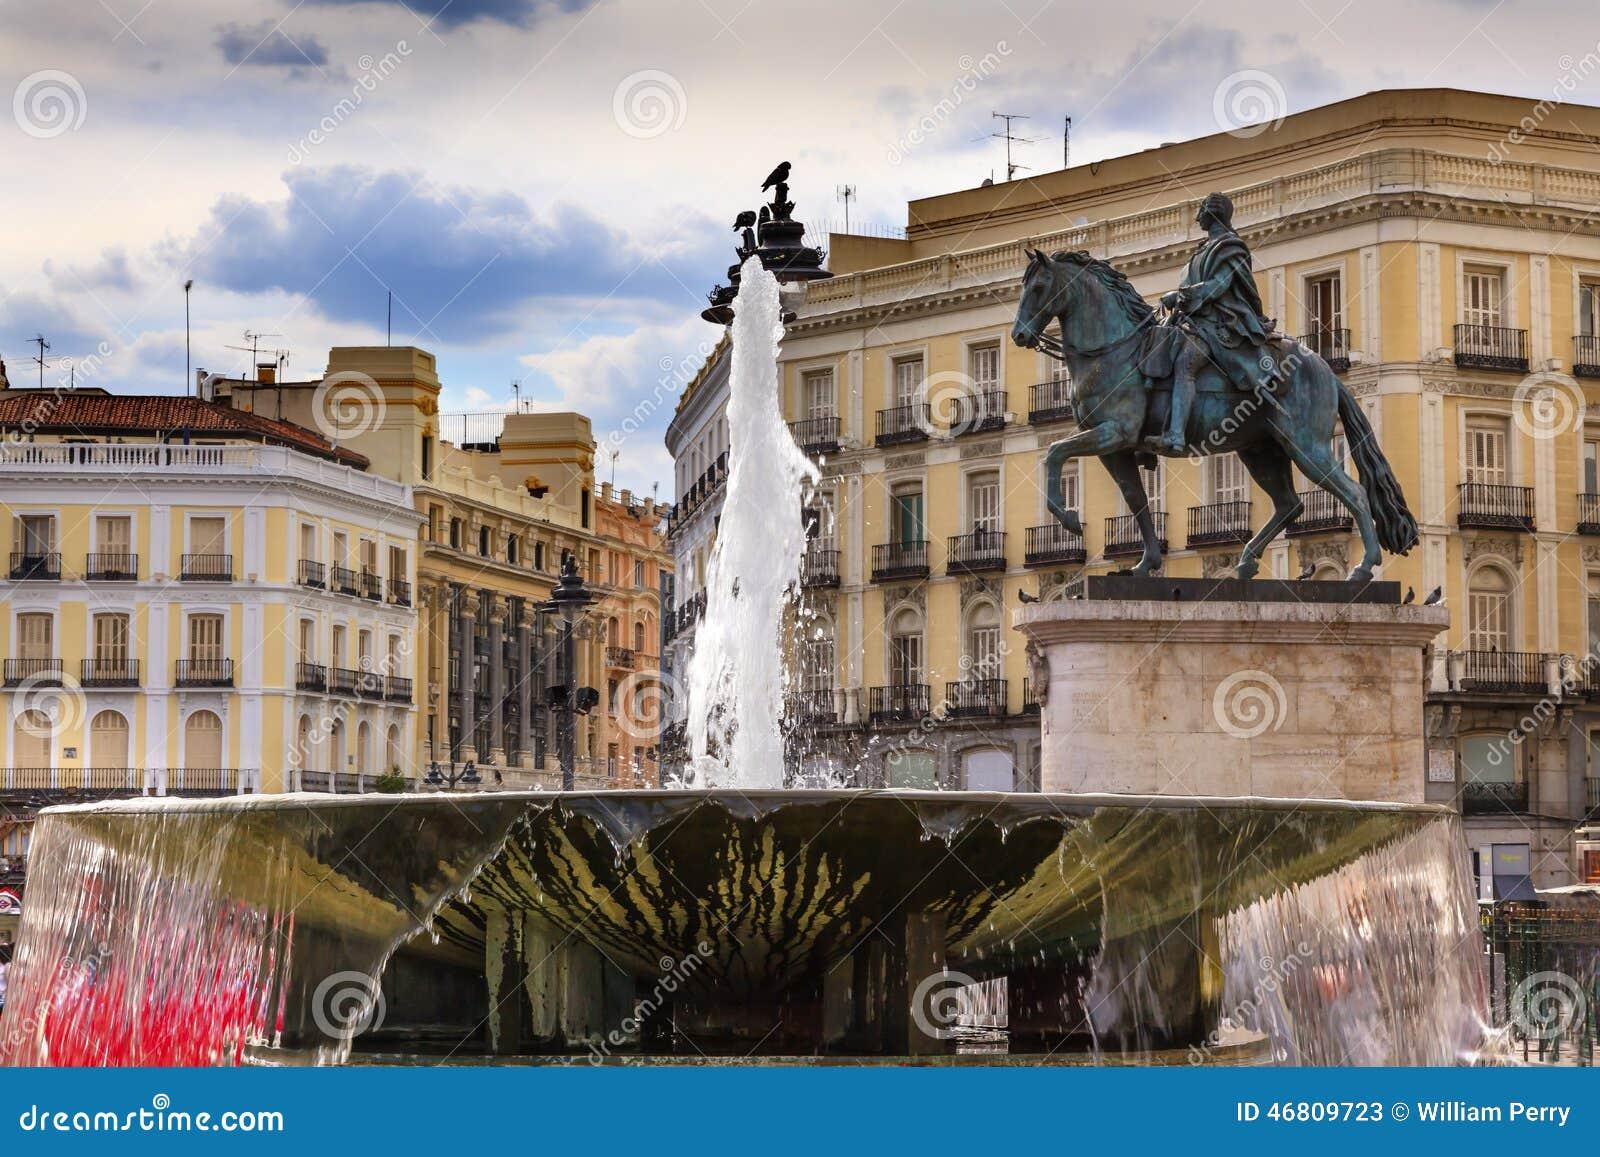 Puerta del sol plaza square fountain madrid spain stock for Plaza de puerta del sol madrid